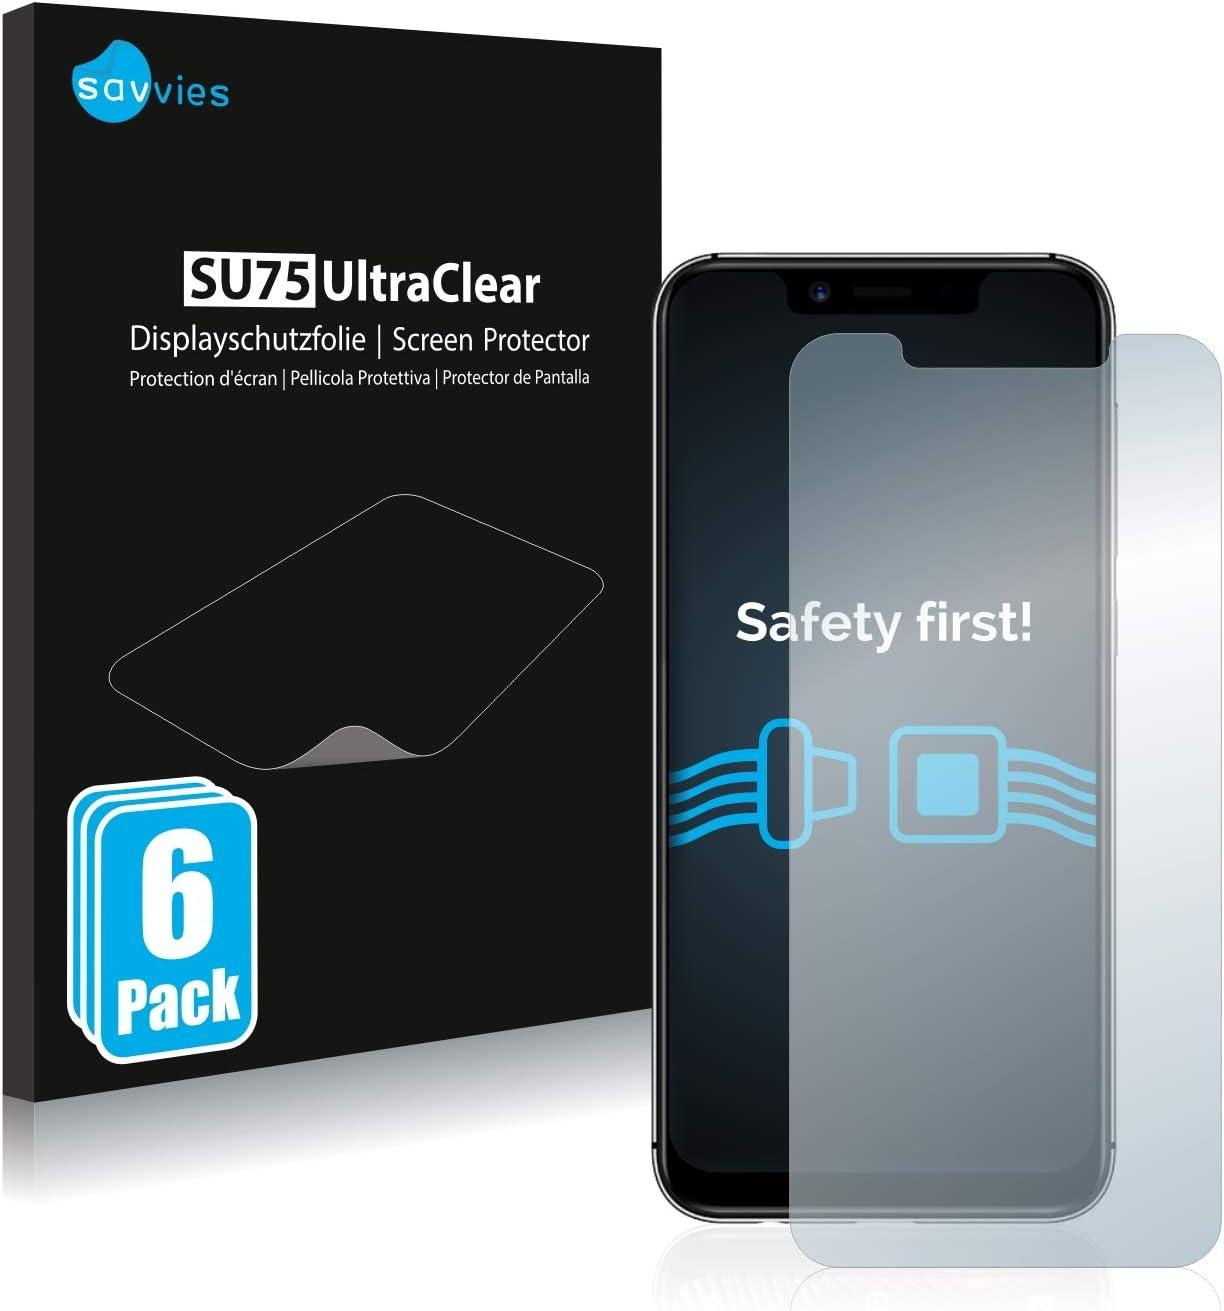 savvies Protector Pantalla Compatible con Umidigi A3 Pro (6 Unidades) Pelicula Ultra Transparente: Amazon.es: Electrónica